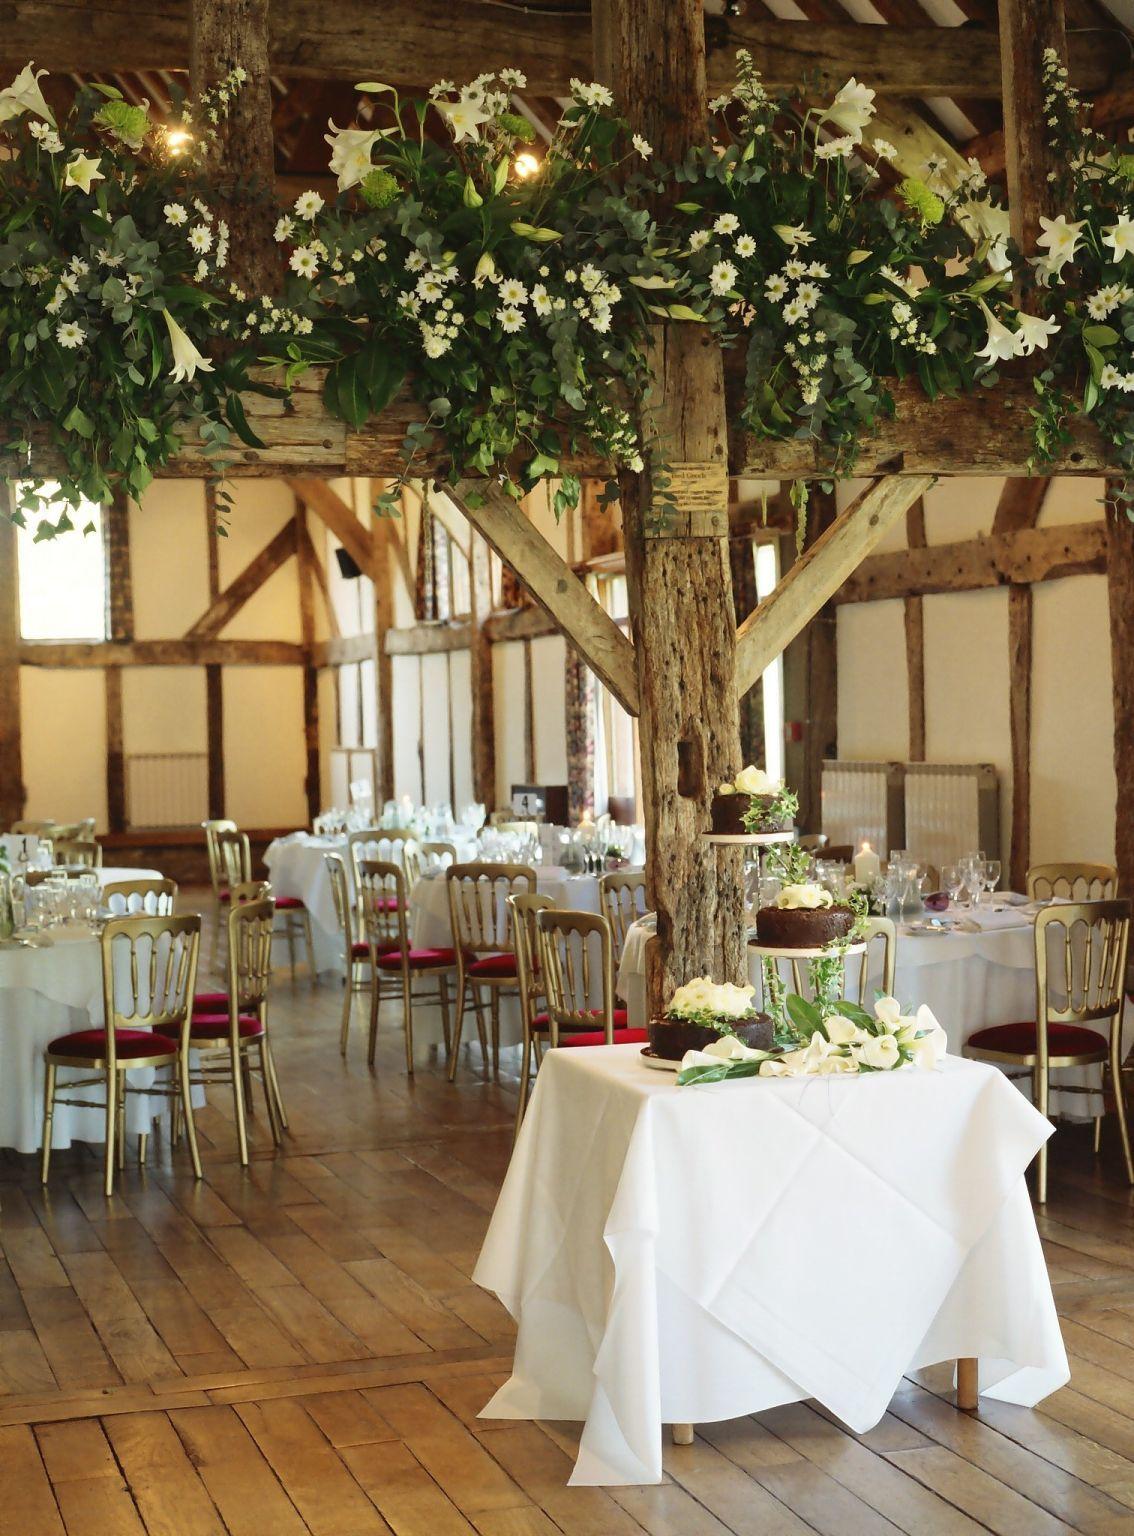 20 Farm Wedding Ideas Decorations and Favors | Floral & Decor Ideas ...